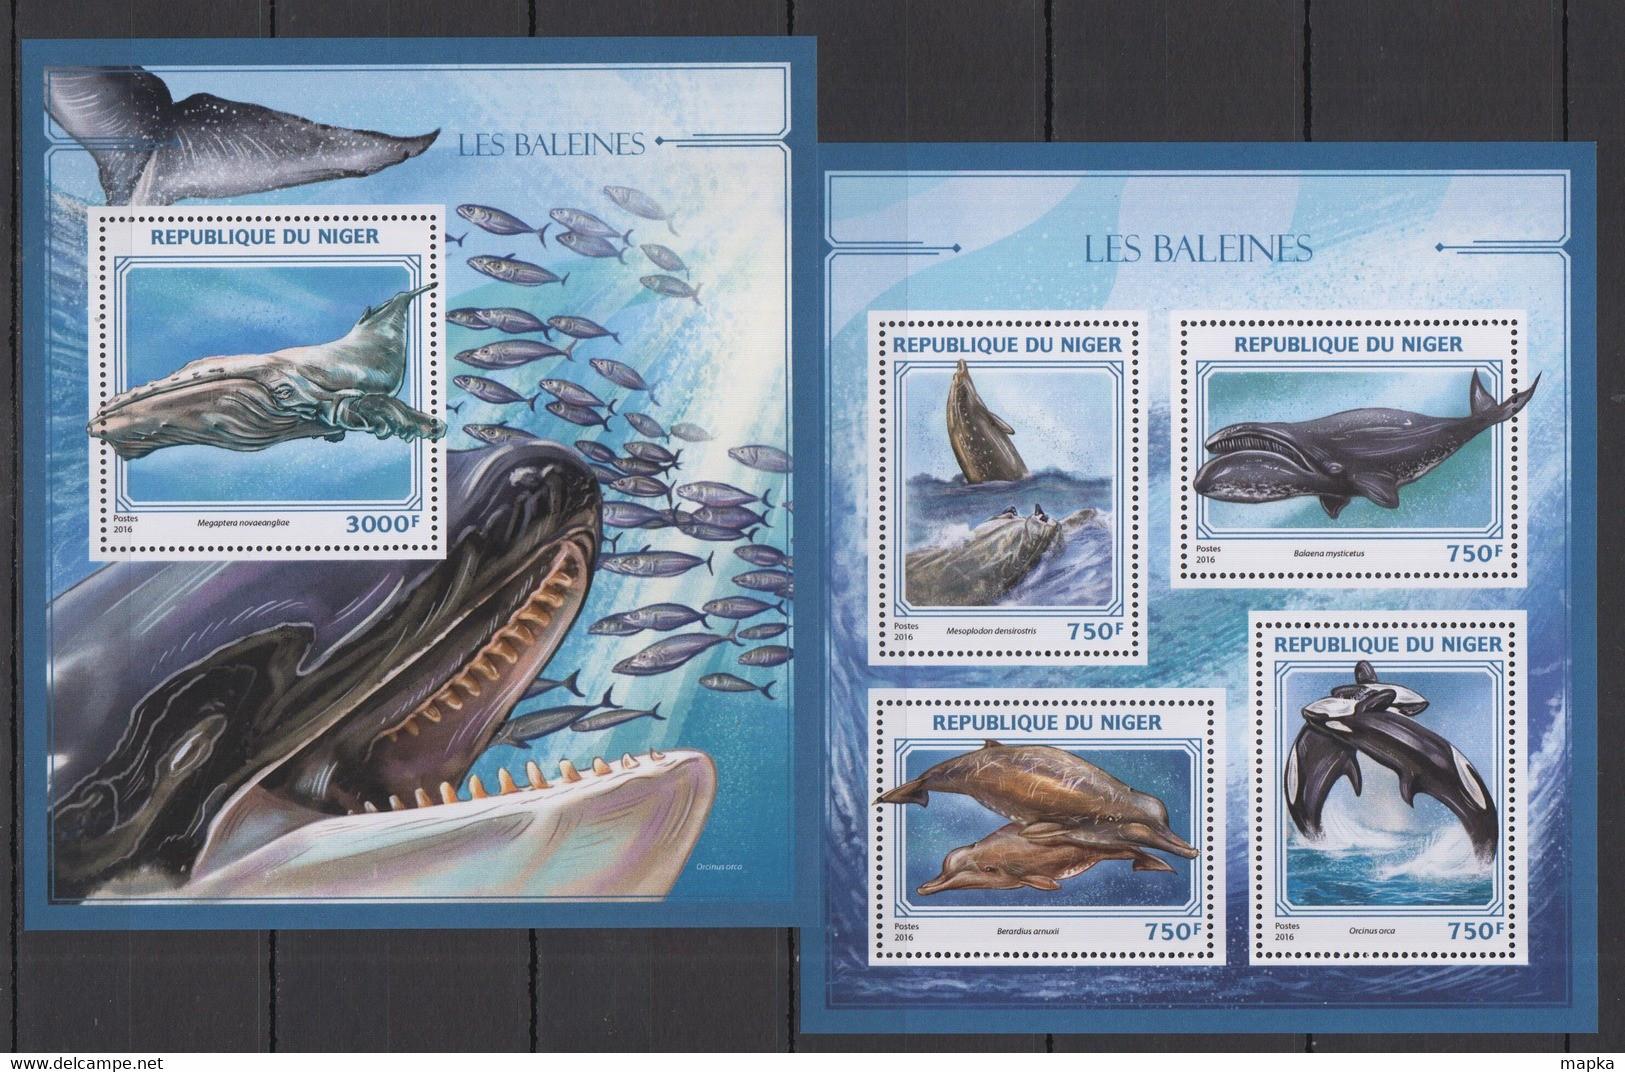 ST1888 2016 NIGER FAUNA FISH & MARINE LIFE LES BALEINES WHALES KB+BL MNH - Ballenas